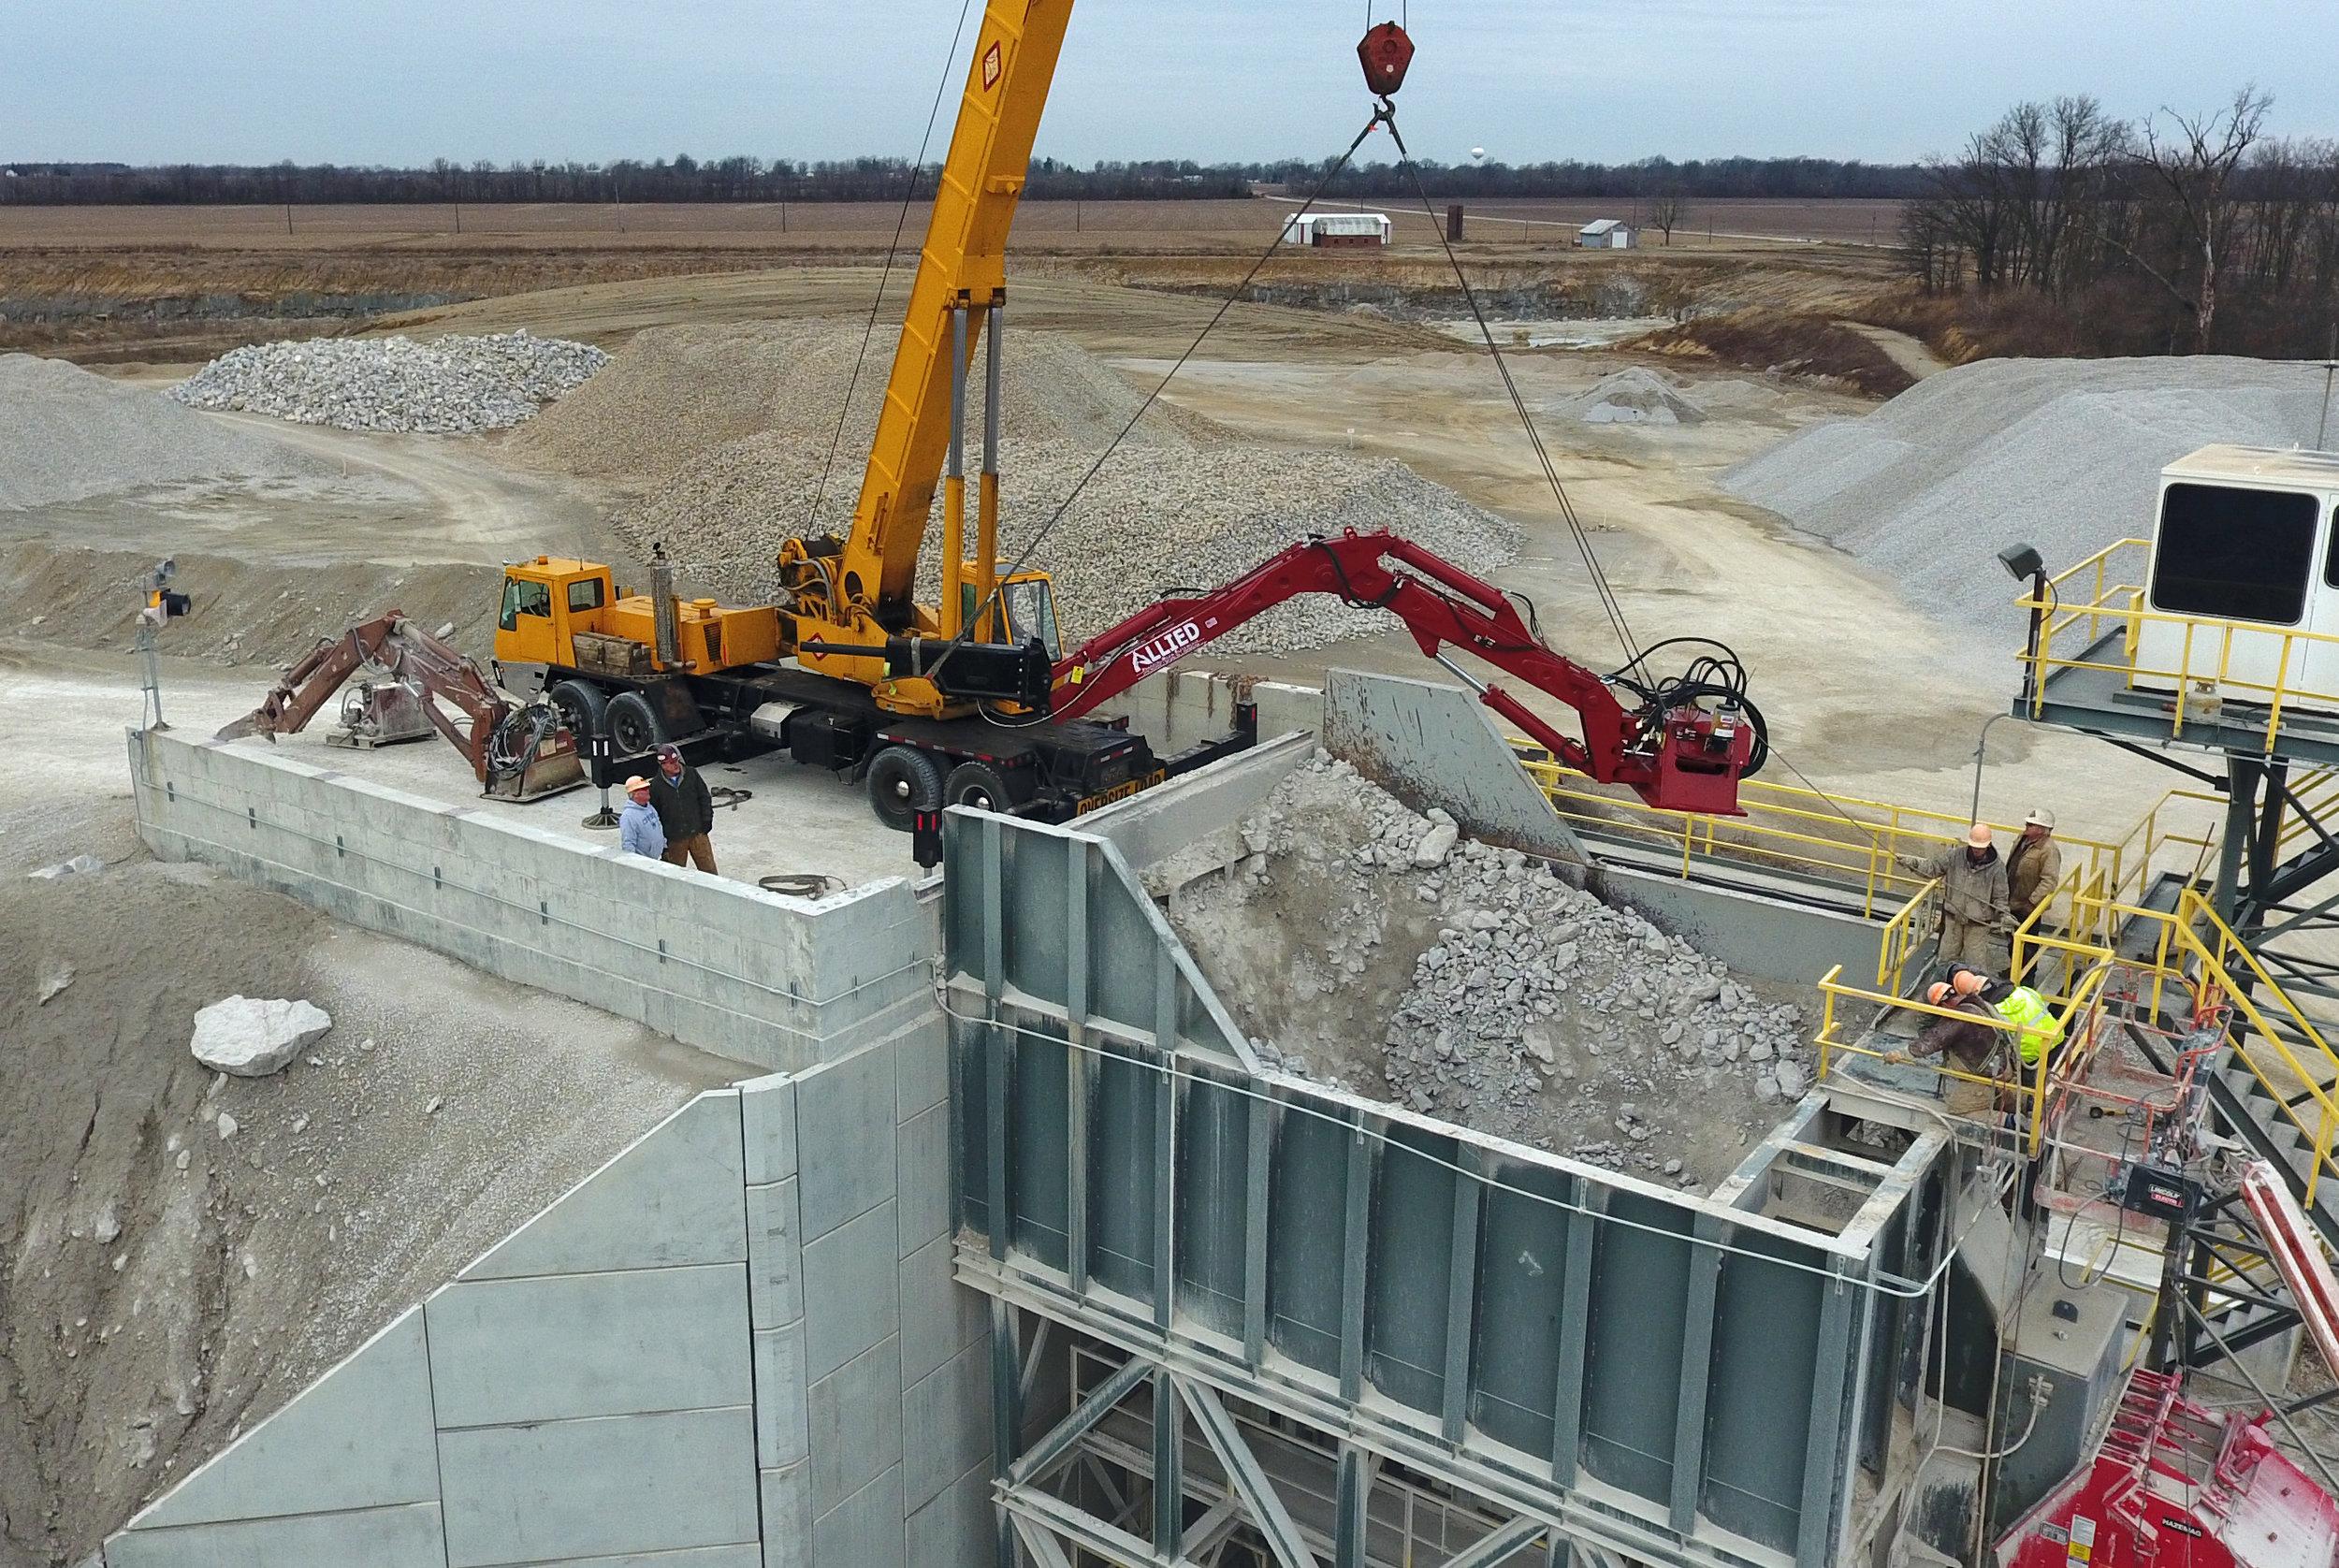 Installation of New Allied Rock Breaker Boom - February 2017